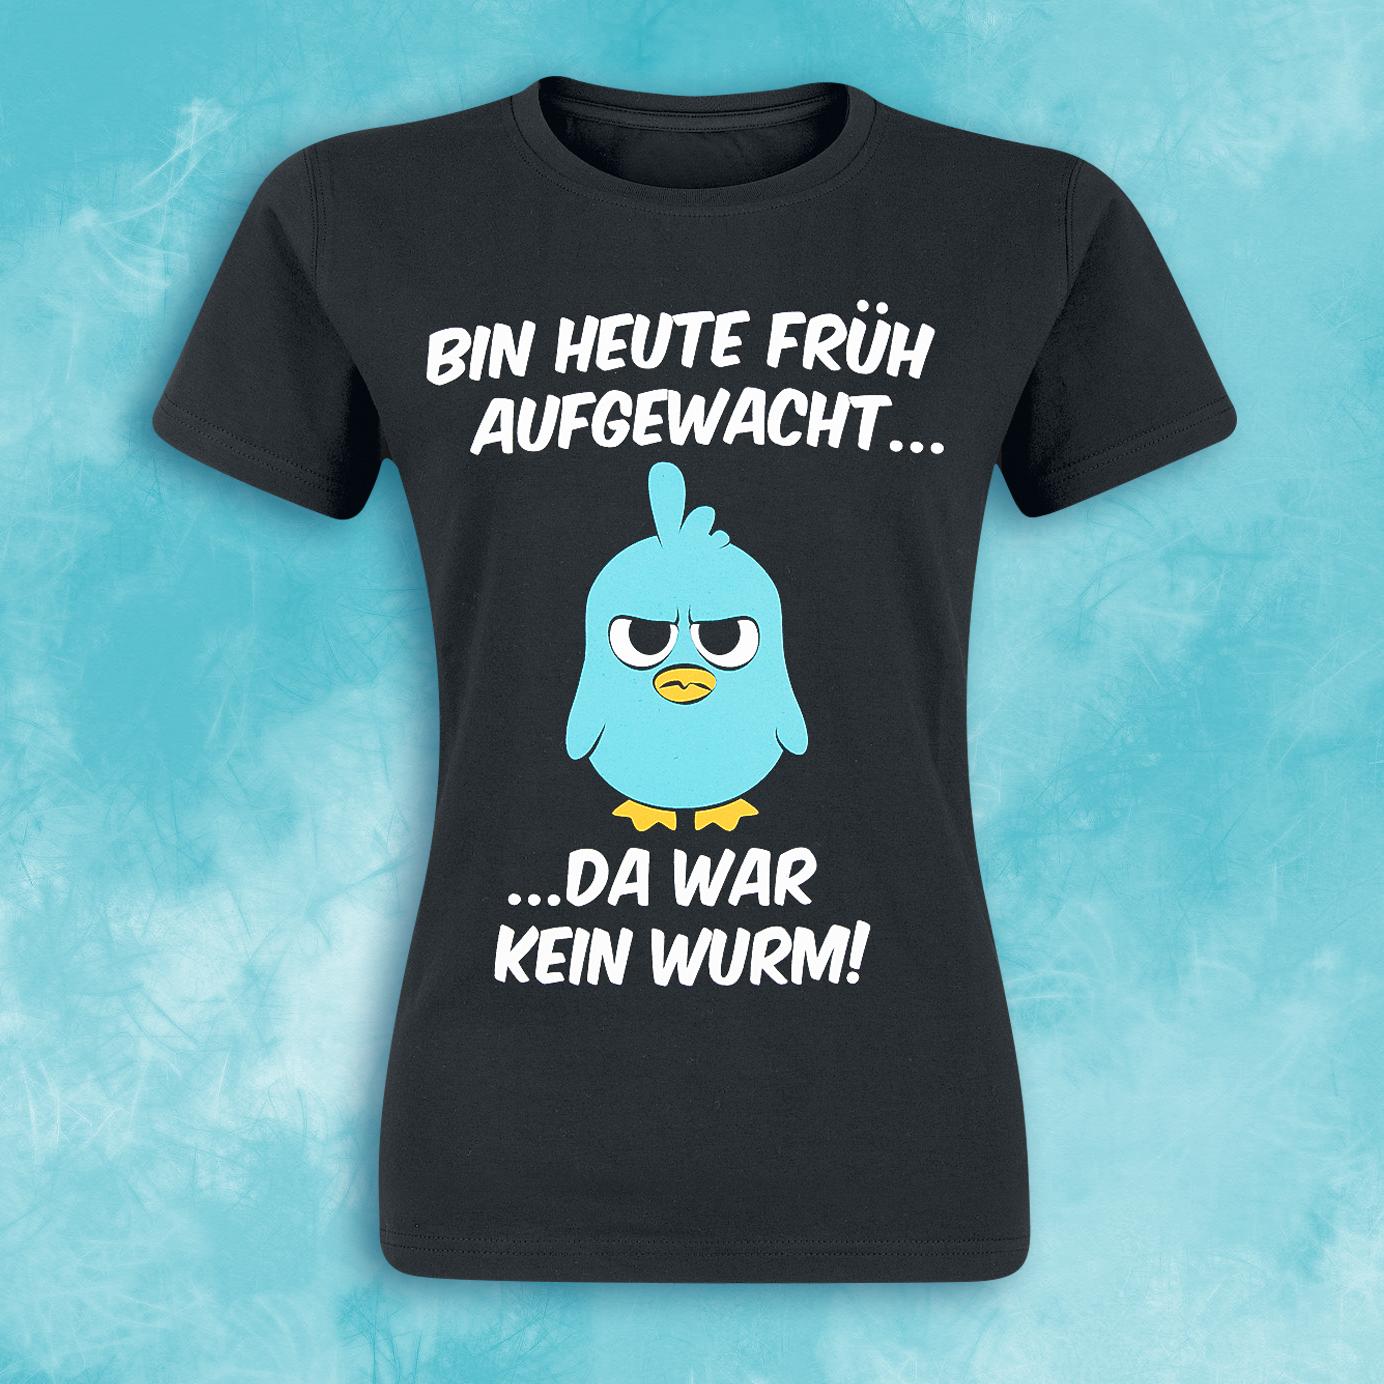 Elektronikerin Damen T-Shirt Fun Shirt Spruch Beruf Arbeit Geschenk Idee lustig